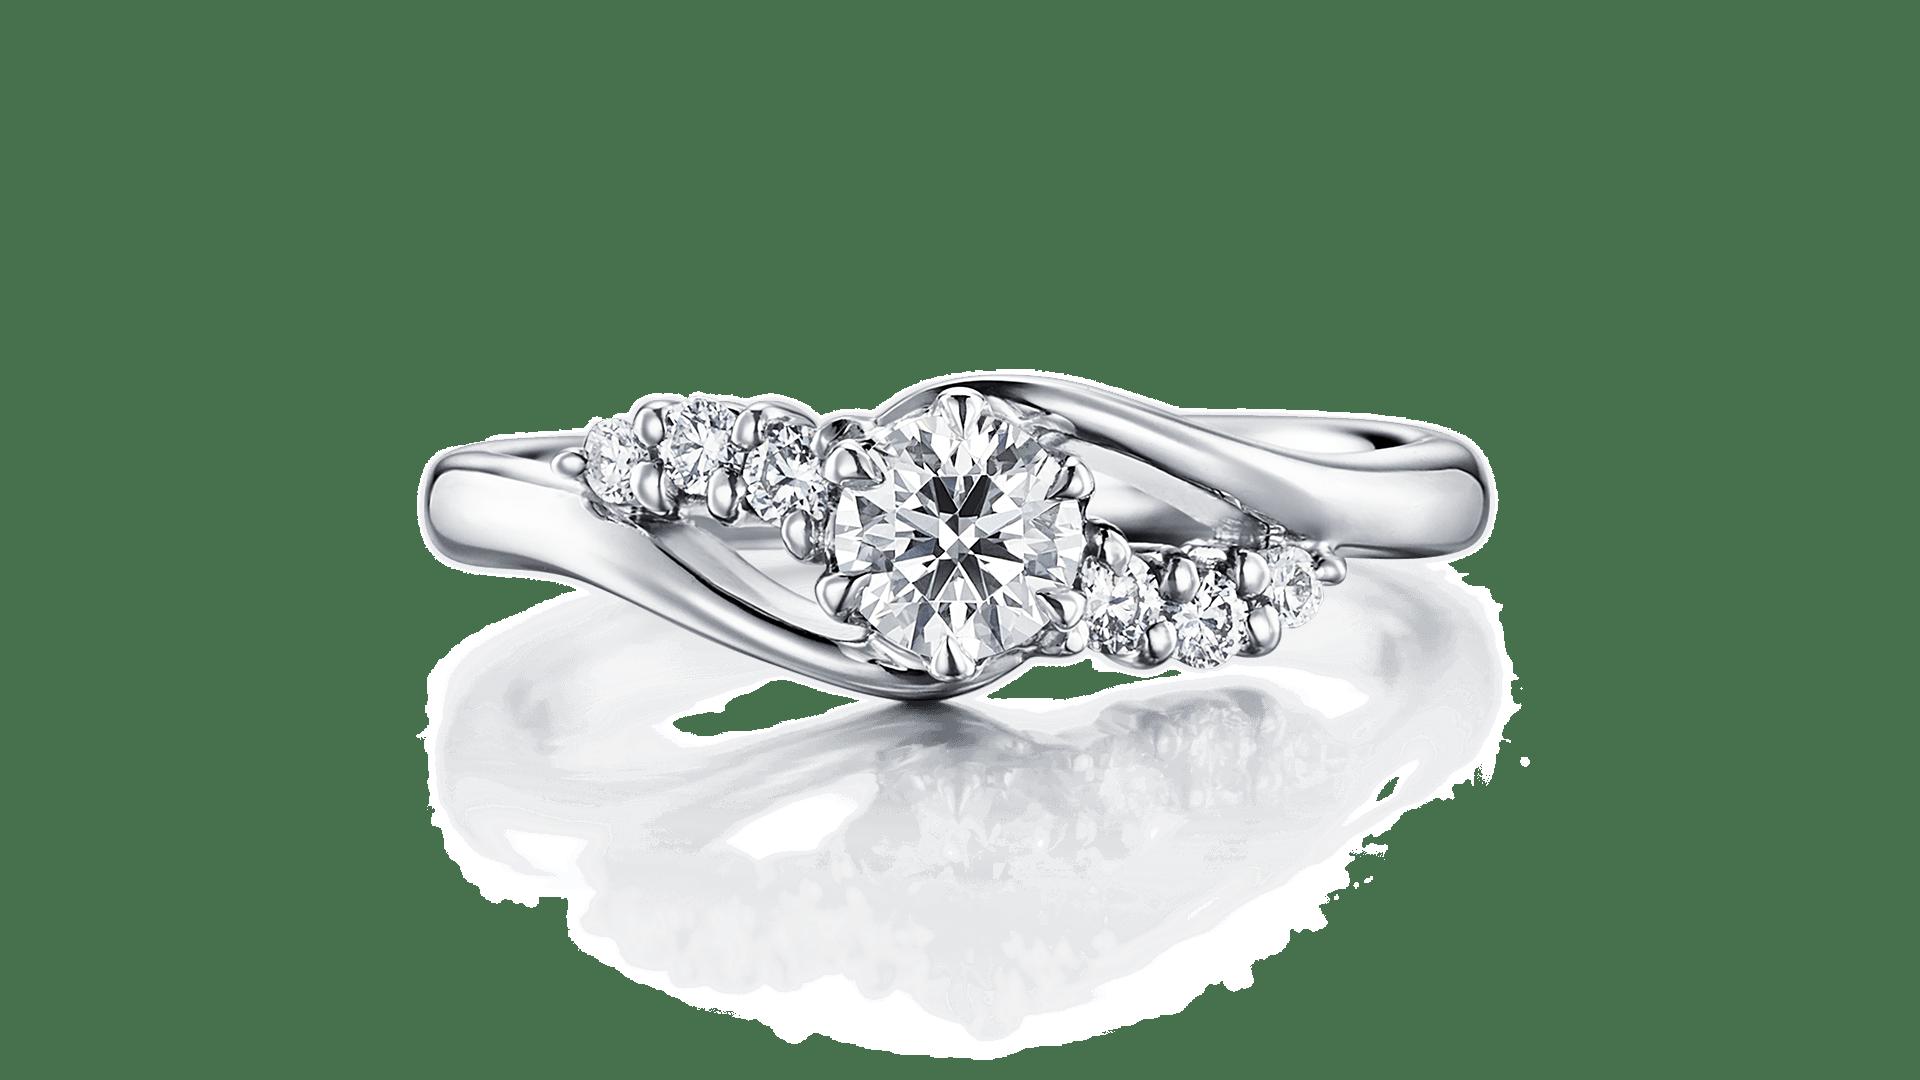 atria アトリア | 婚約指輪サムネイル 1